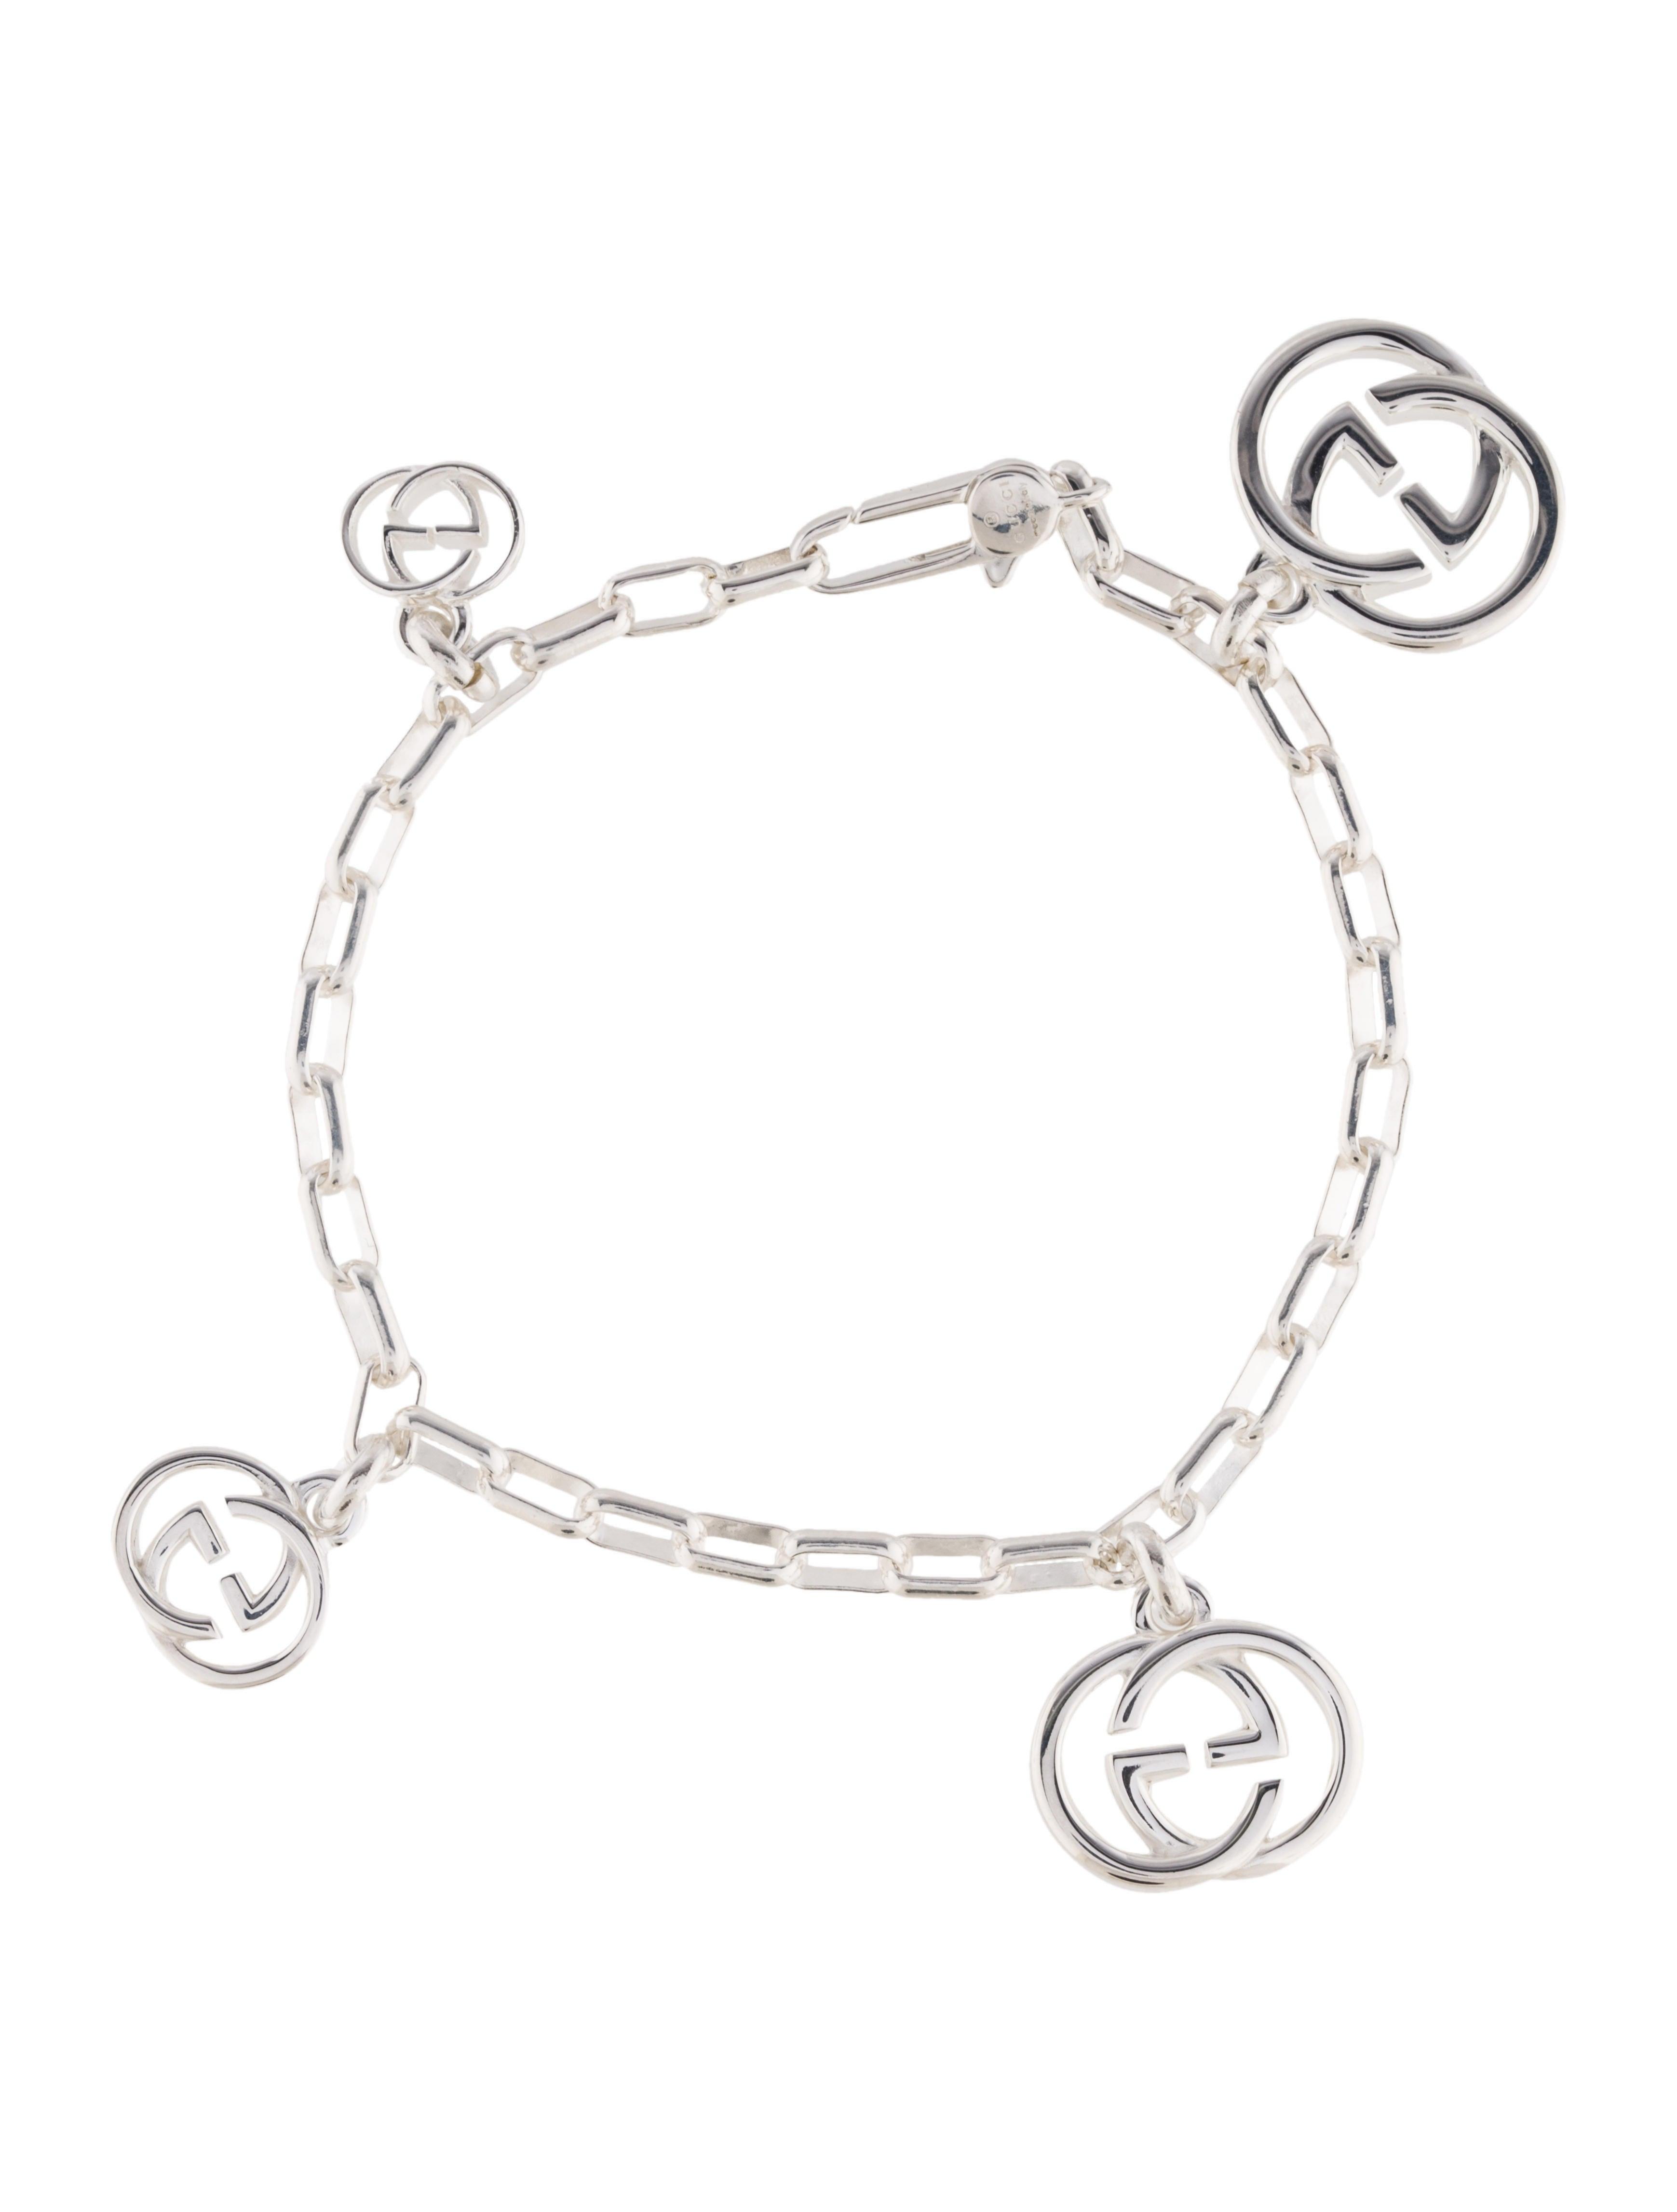 ebf355699 Gucci Interlocking G Charm Bracelet - Bracelets - GUC164580 | The ...